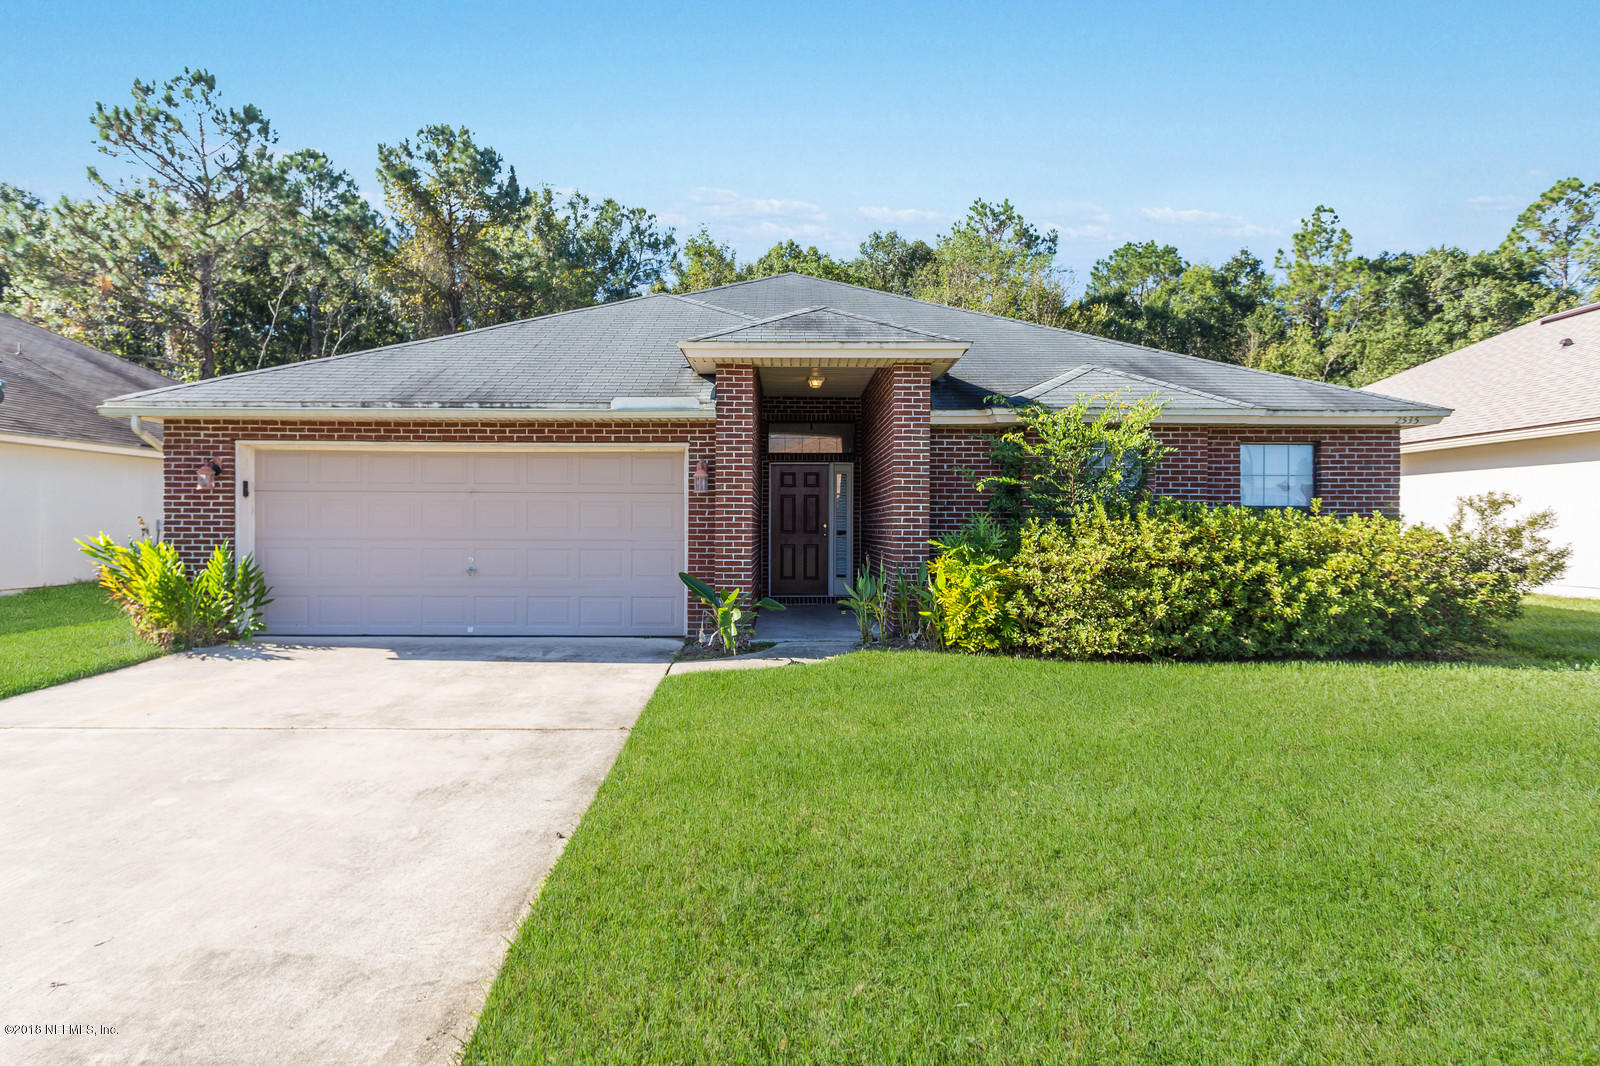 2535 WATERMILL, ORANGE PARK, FLORIDA 32073, 4 Bedrooms Bedrooms, ,2 BathroomsBathrooms,Residential - single family,For sale,WATERMILL,961308